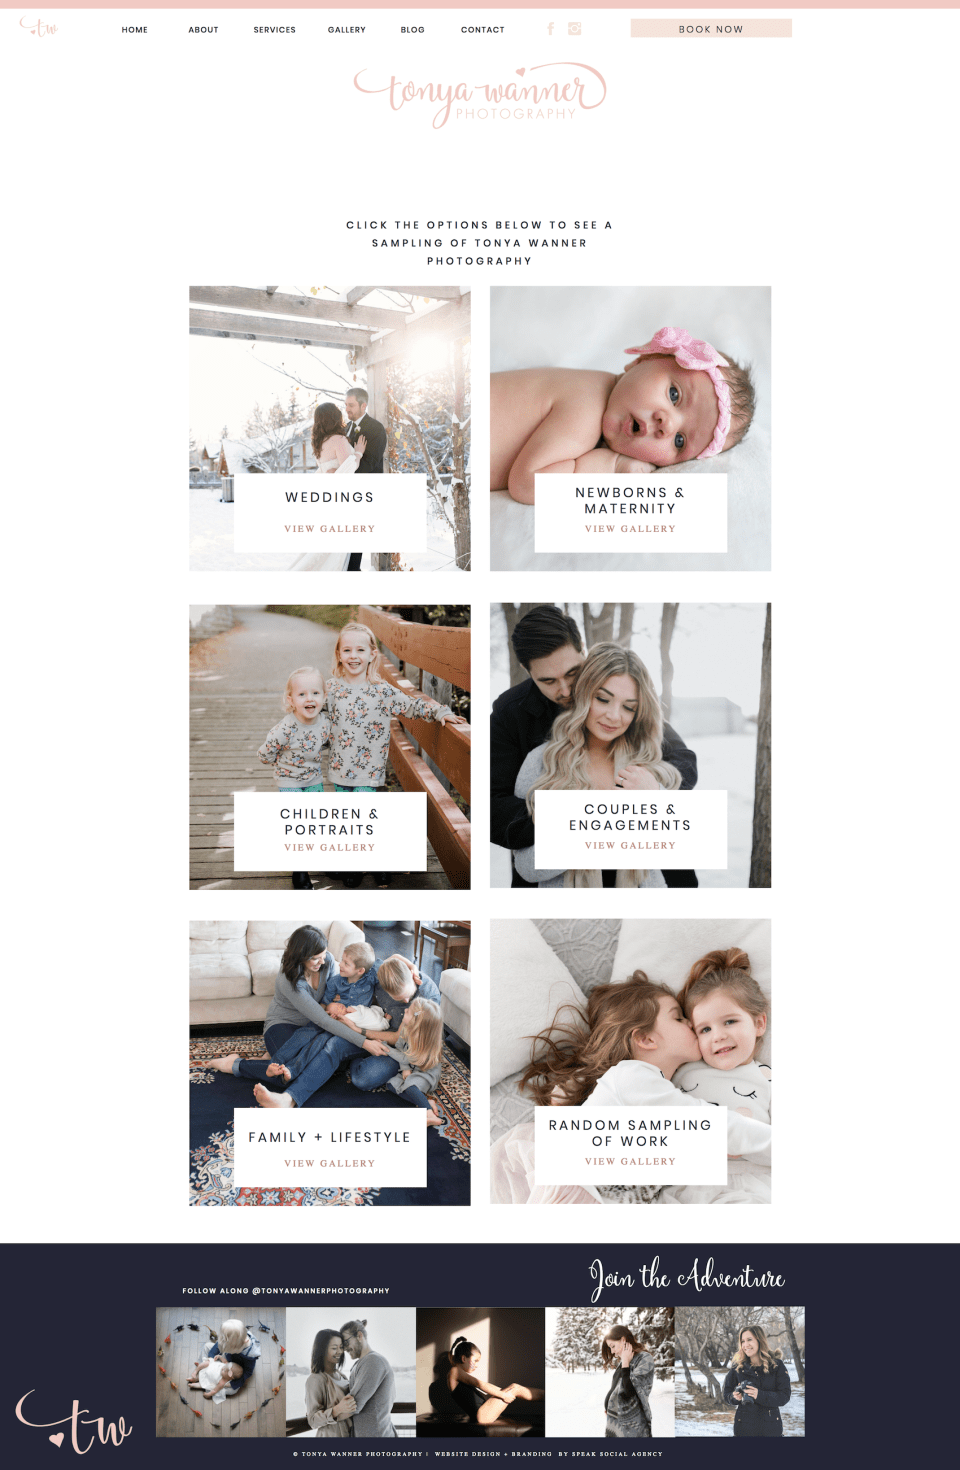 Showit website design for photographer - feminine, pink website for newborn, maternity and family photographer